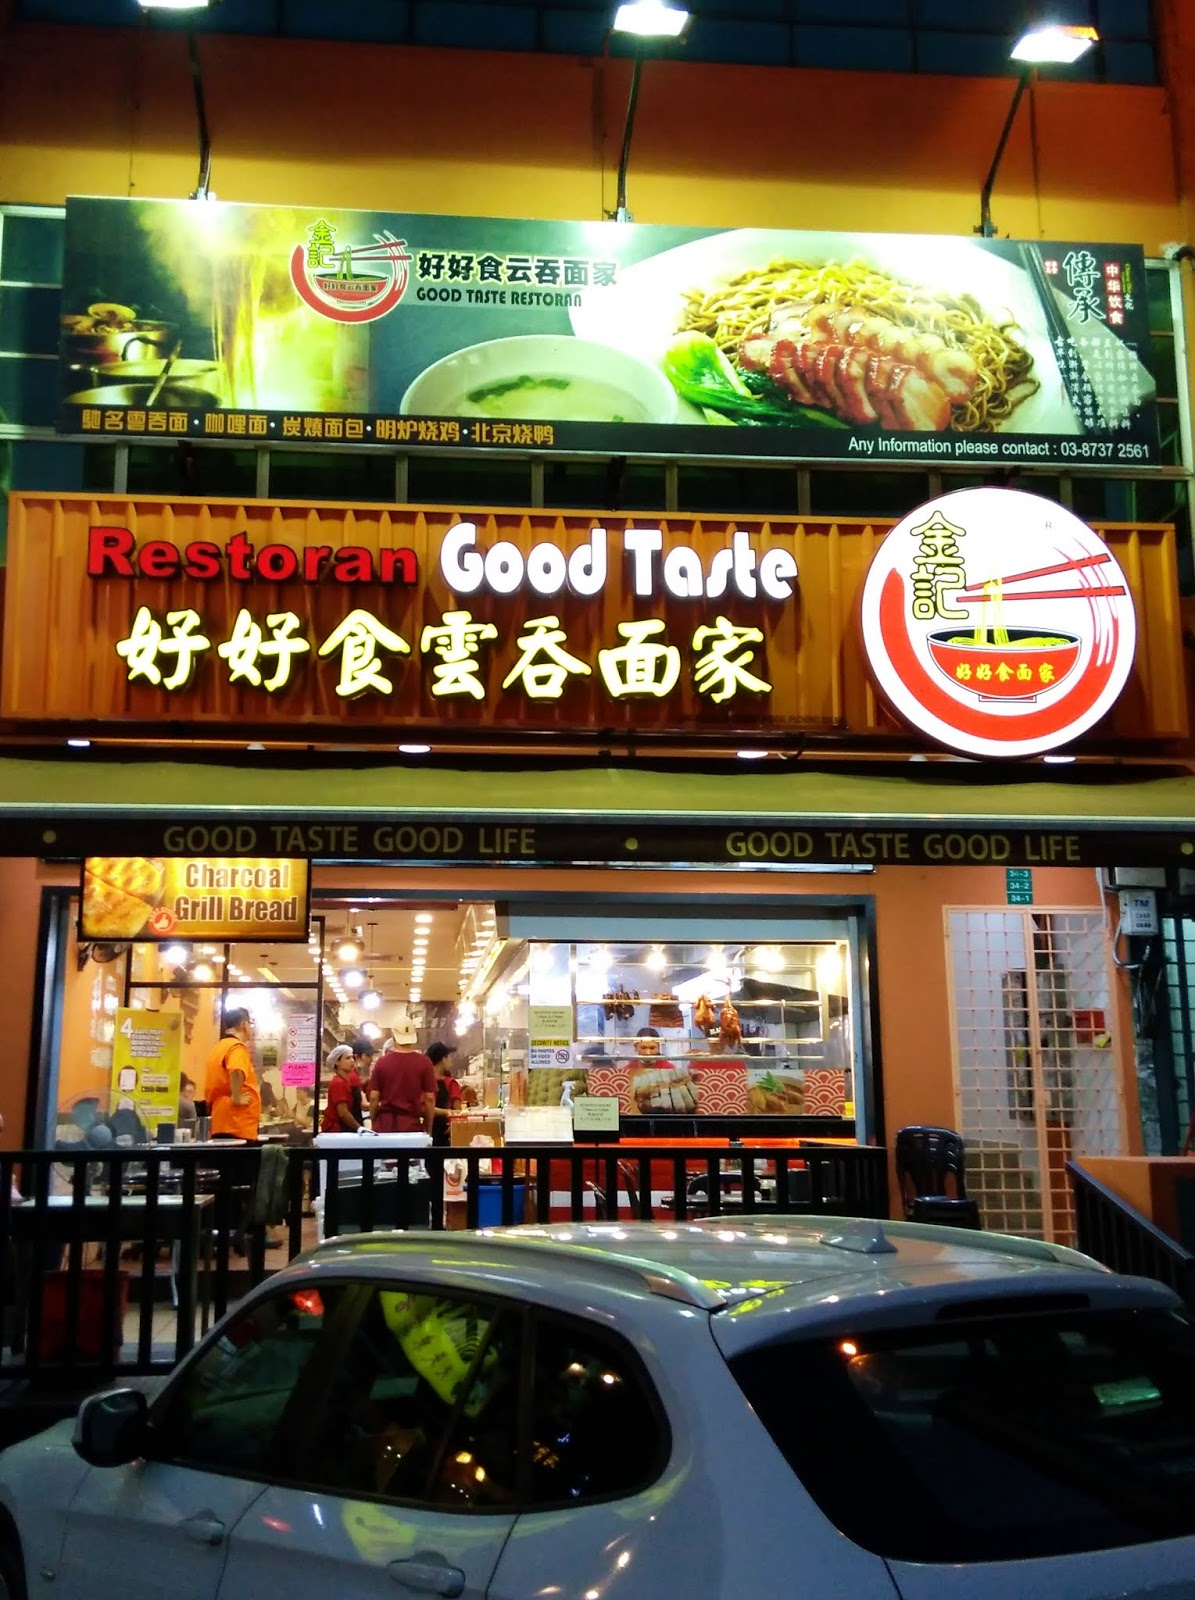 Venoth S Culinary Adventures Good Taste Restaurant